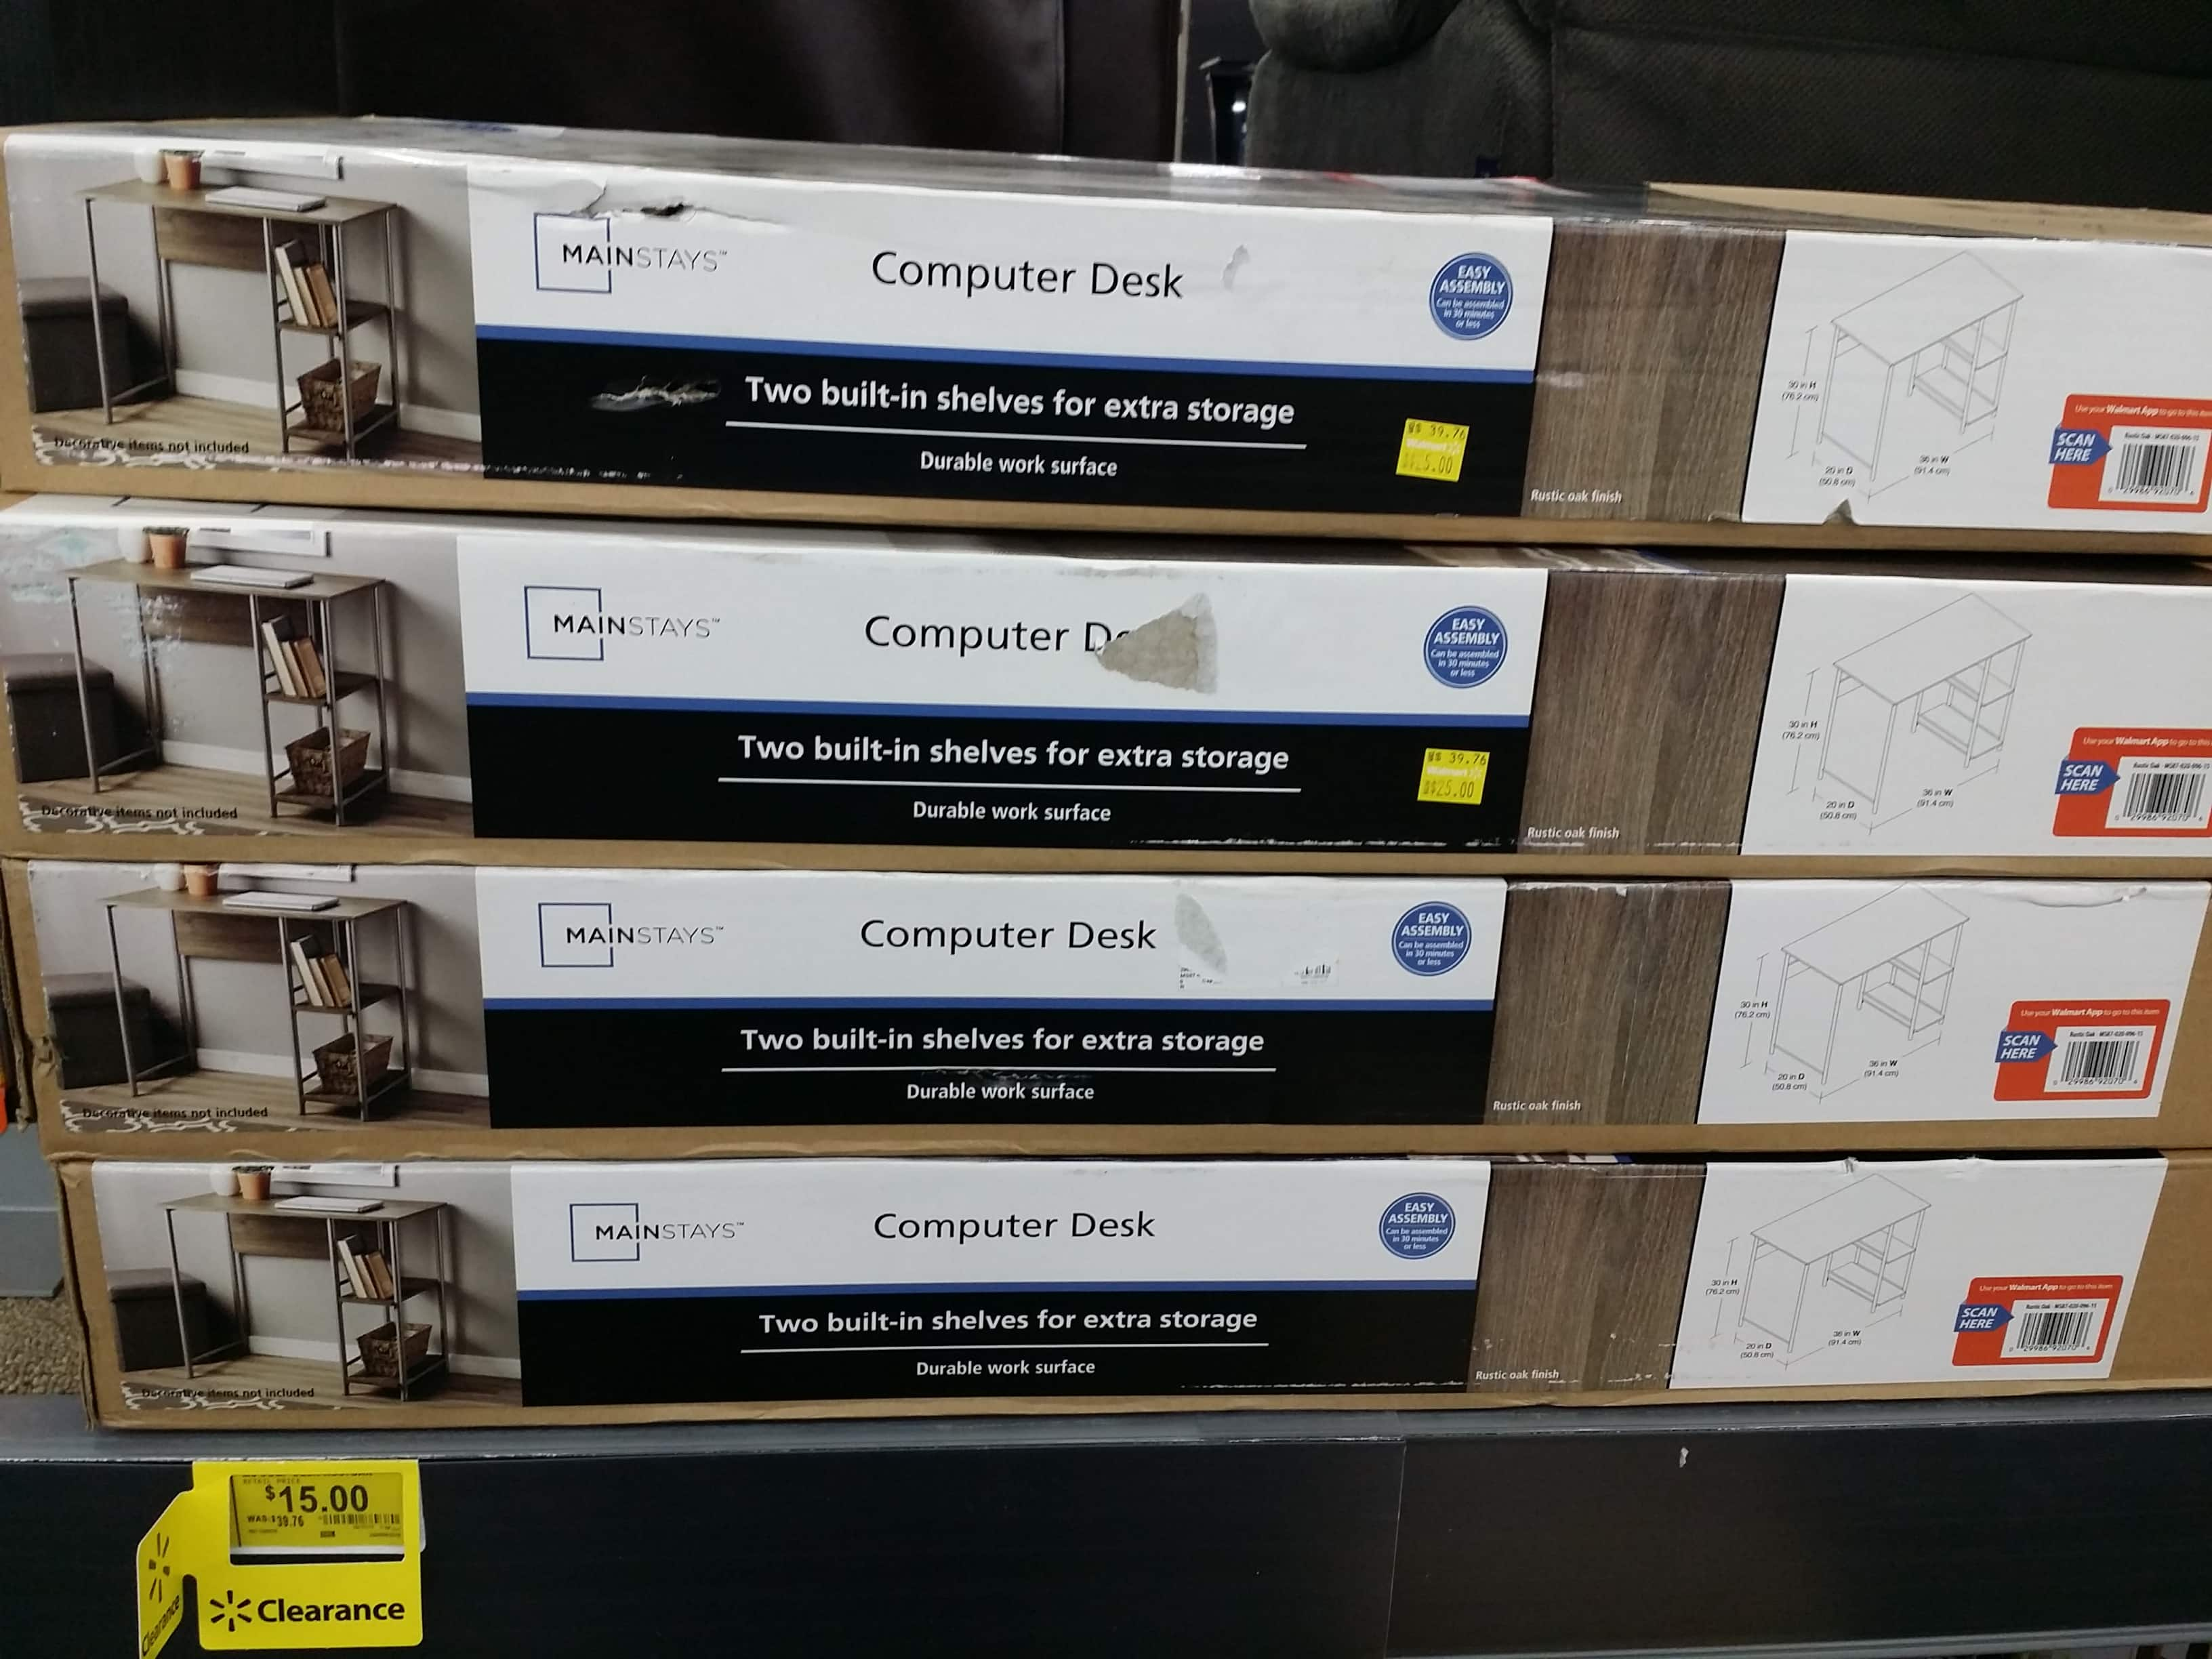 Mainstays Garrett Metal Student Desk  (Rustic oak)-  on clearance at 15 $ - In Store YMMV (Reg price 45.98 $) $15